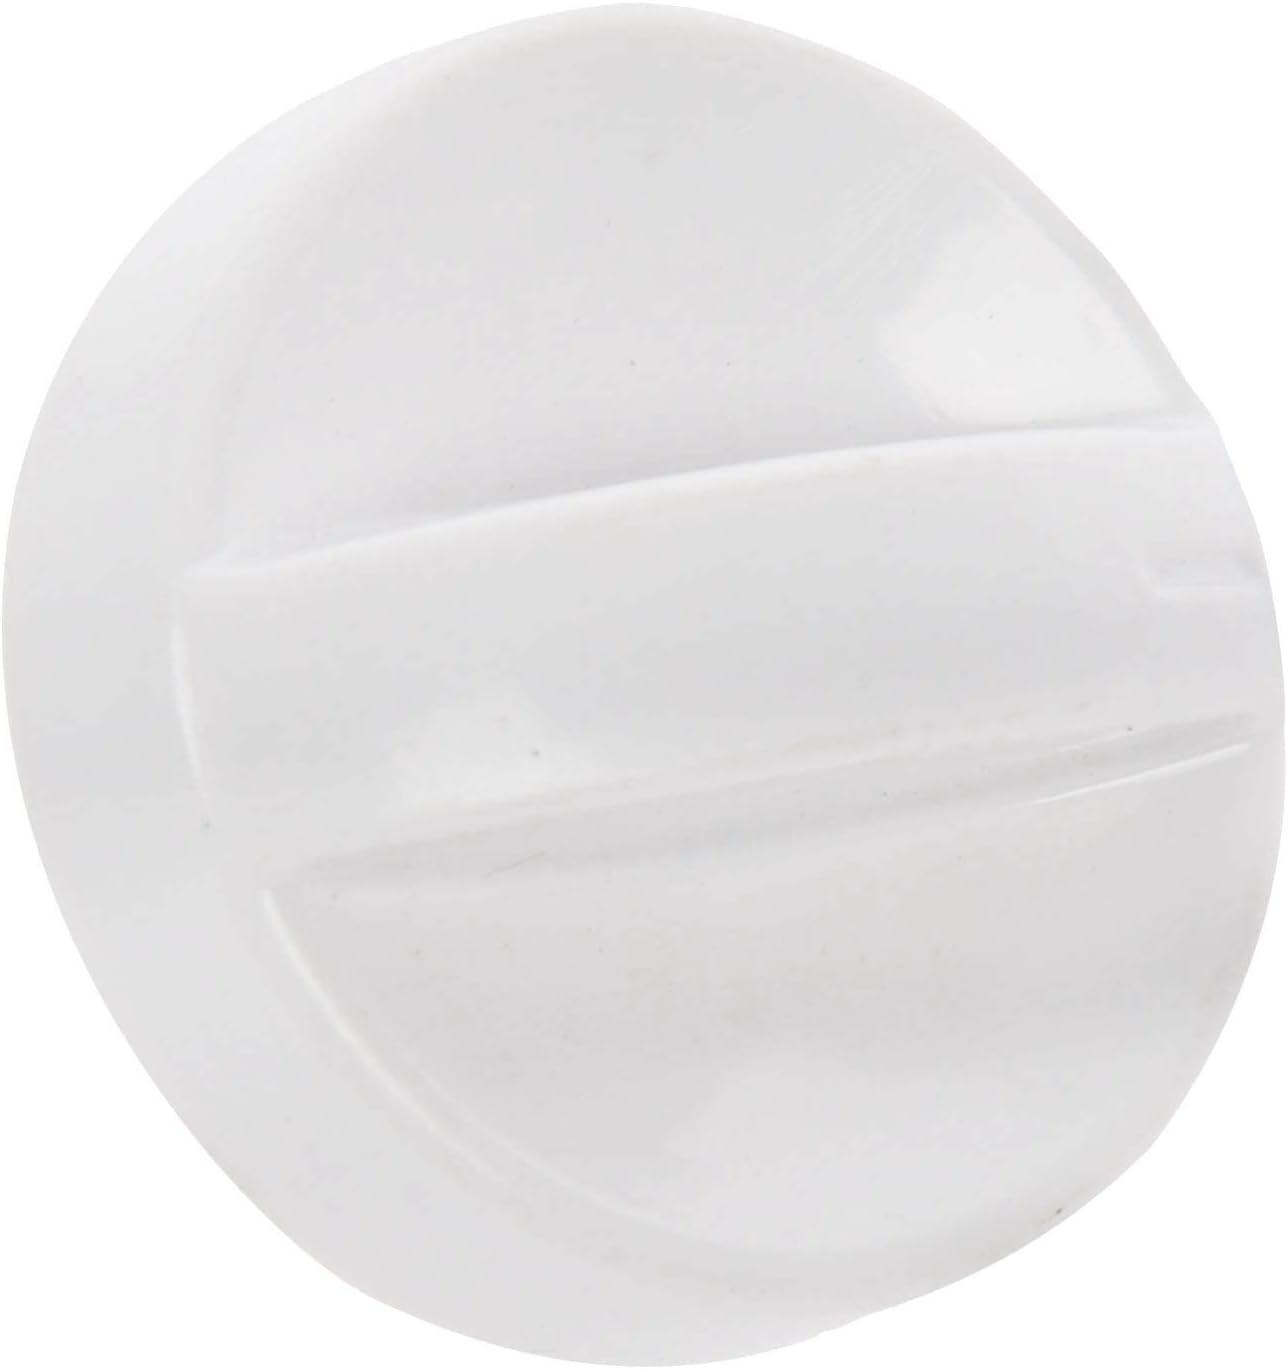 Nrpfell Horno de microondas 11 mm de Largo de Carrete de plastico Perilla giratoria Temporizador